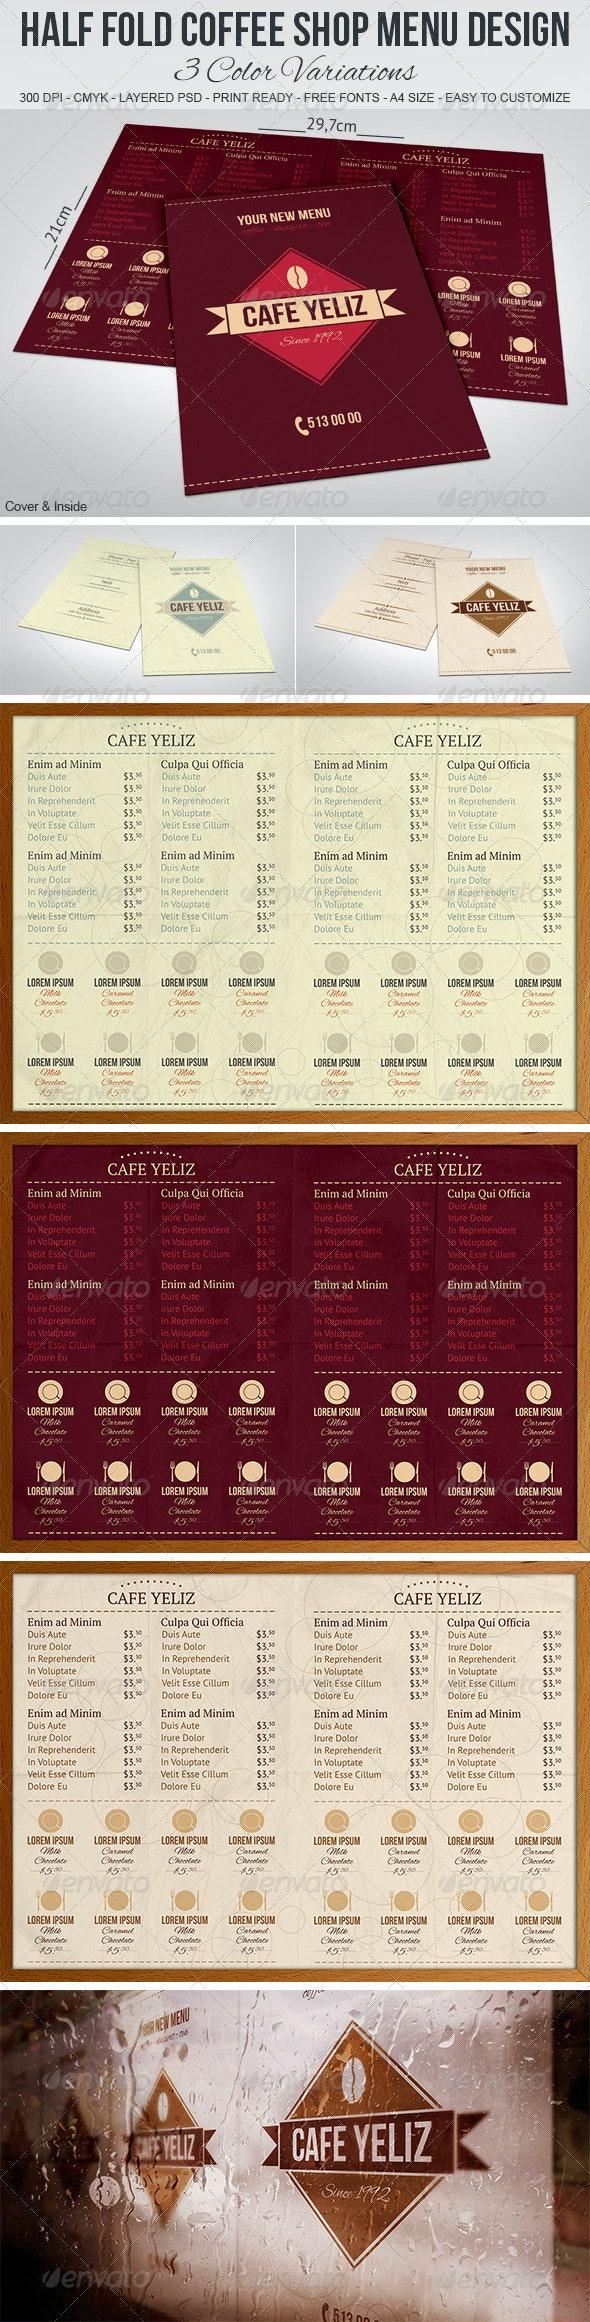 Half Fold Coffee Shop Menu Design - Food Menus Print Templates